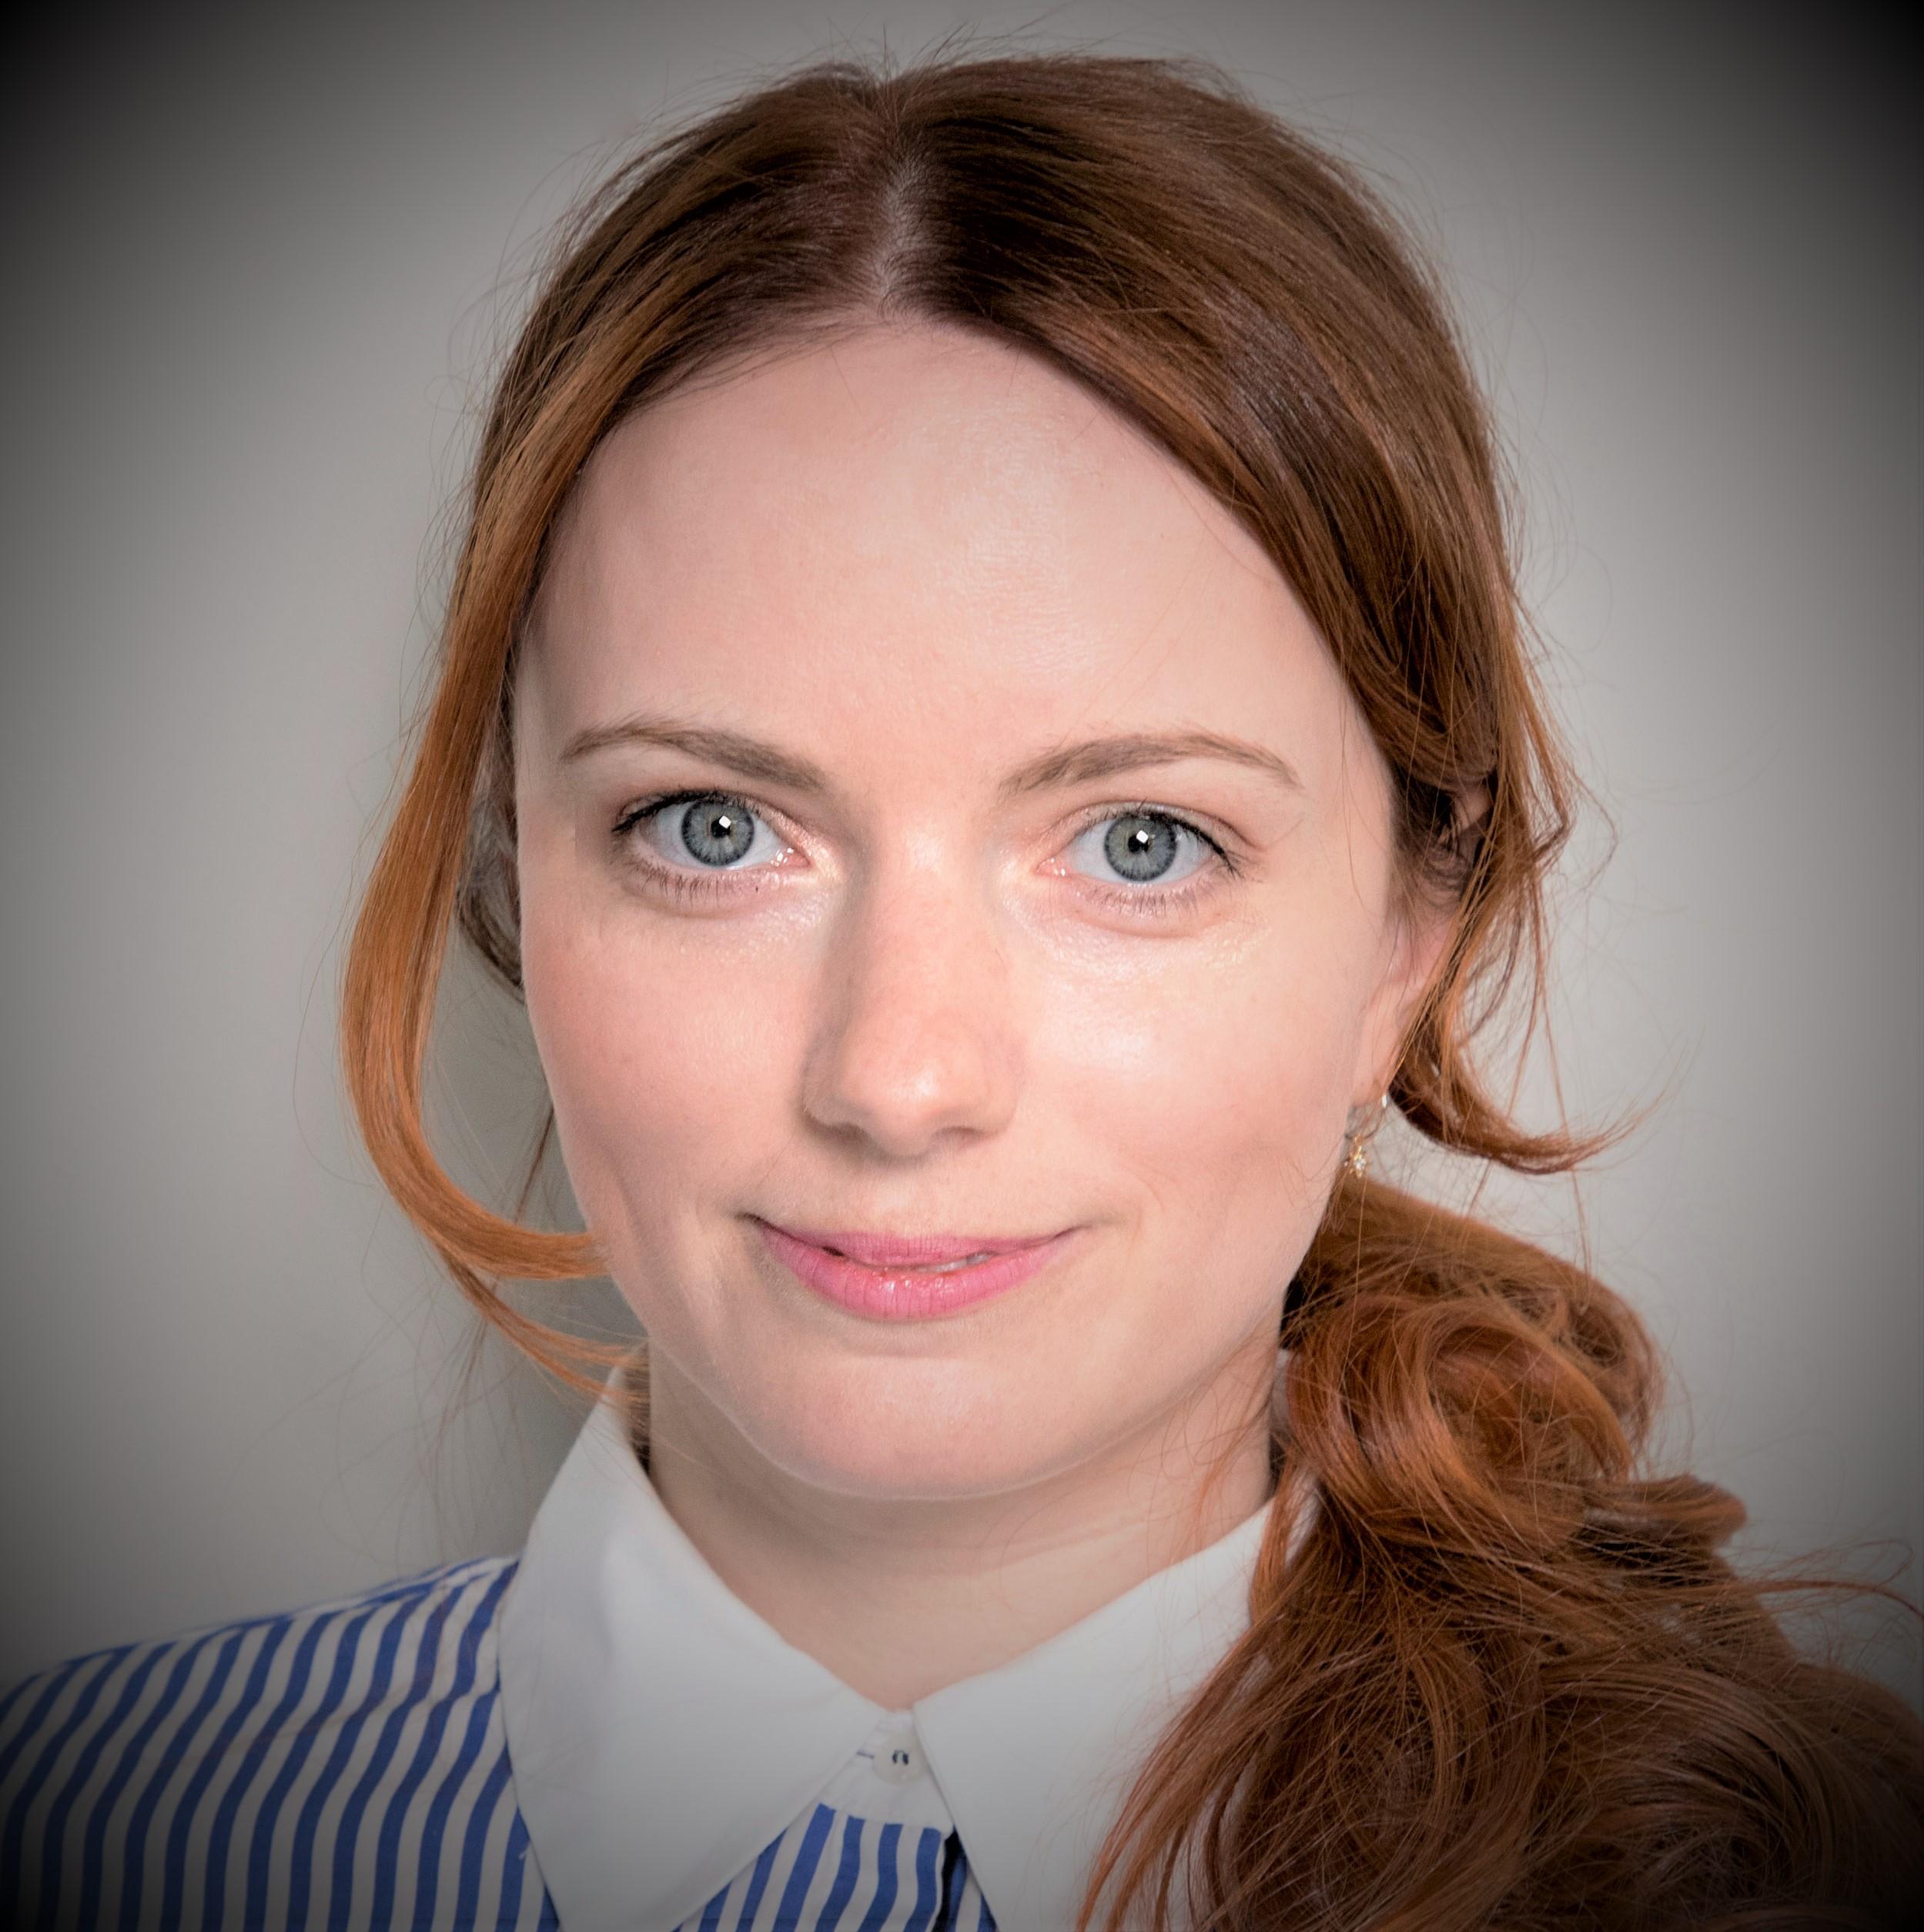 Olesya Protogerova